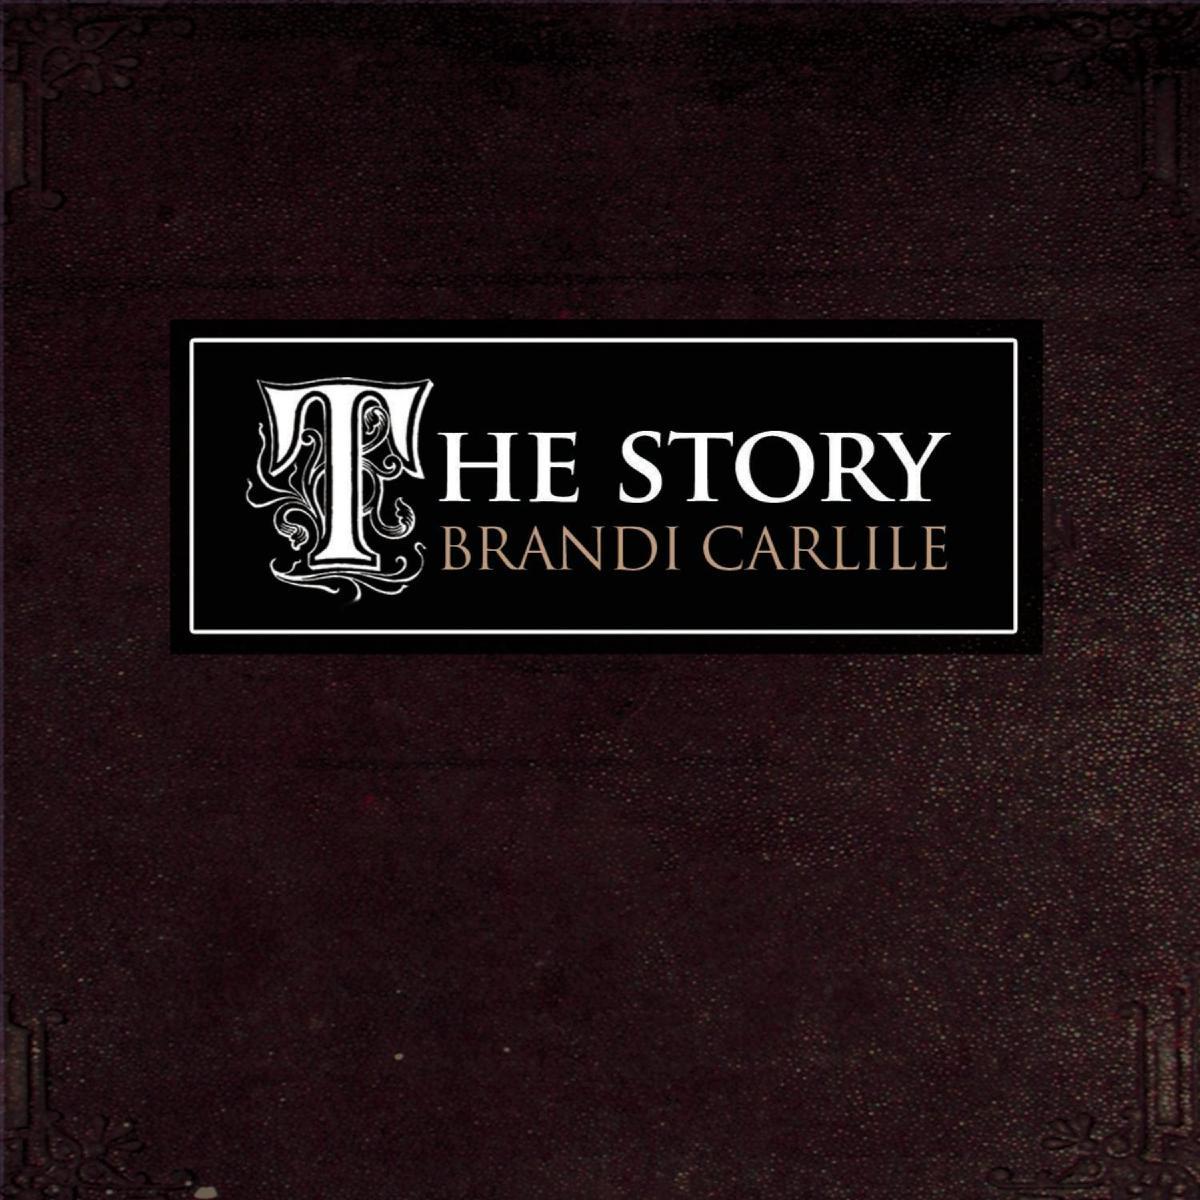 The Story Brandi Carlile: The Story By Brandi Carlile